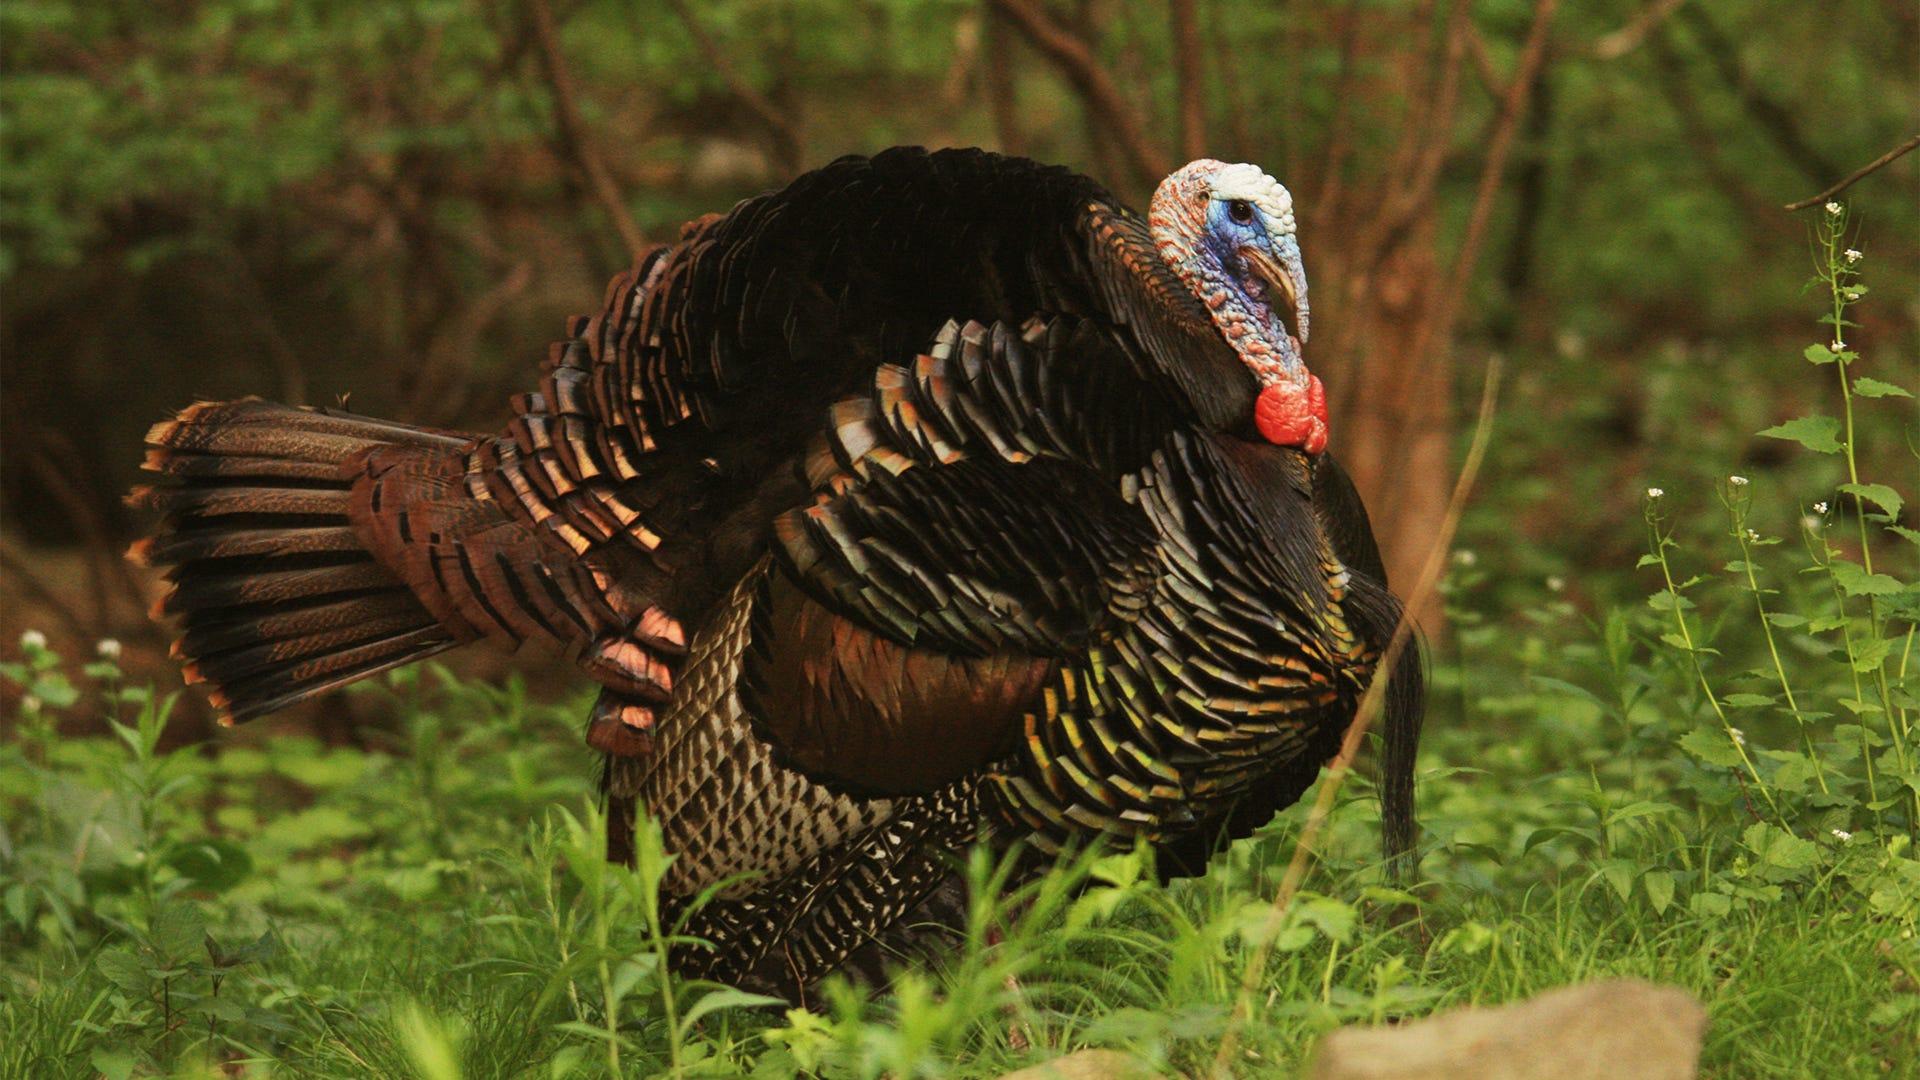 Get to Know: The Turkey